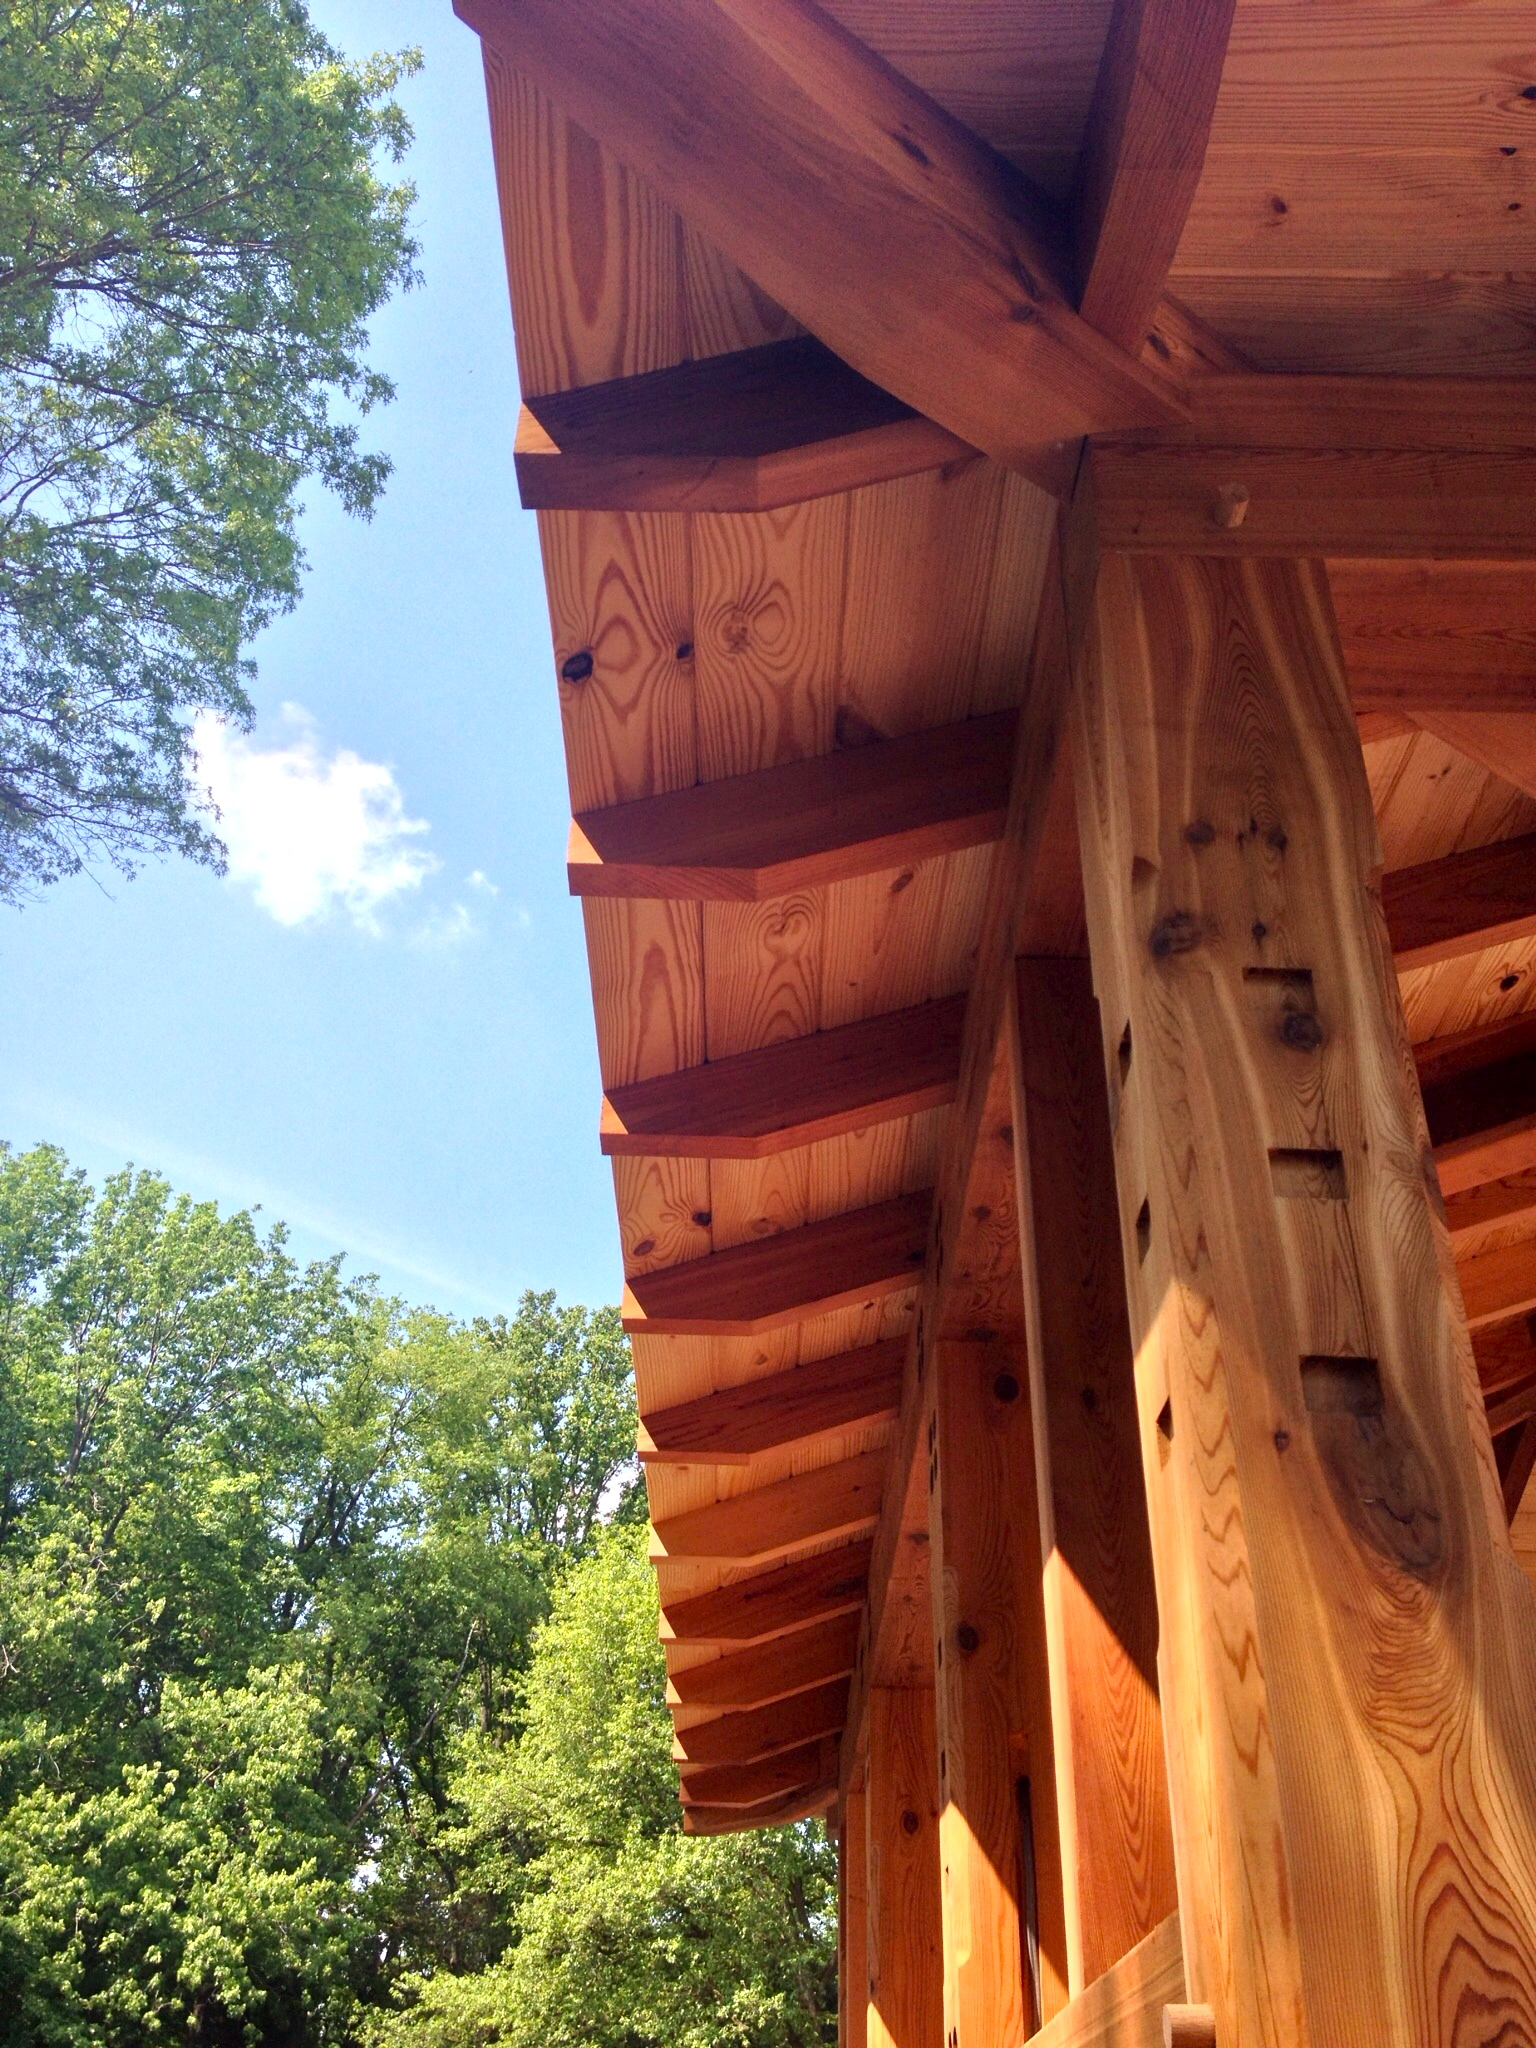 timber framing, Hugh Lofting TImber Framing, Western Red Cedar, timber frame, timber framed porch, timber framed screened in porch, screened in porch, screen porch